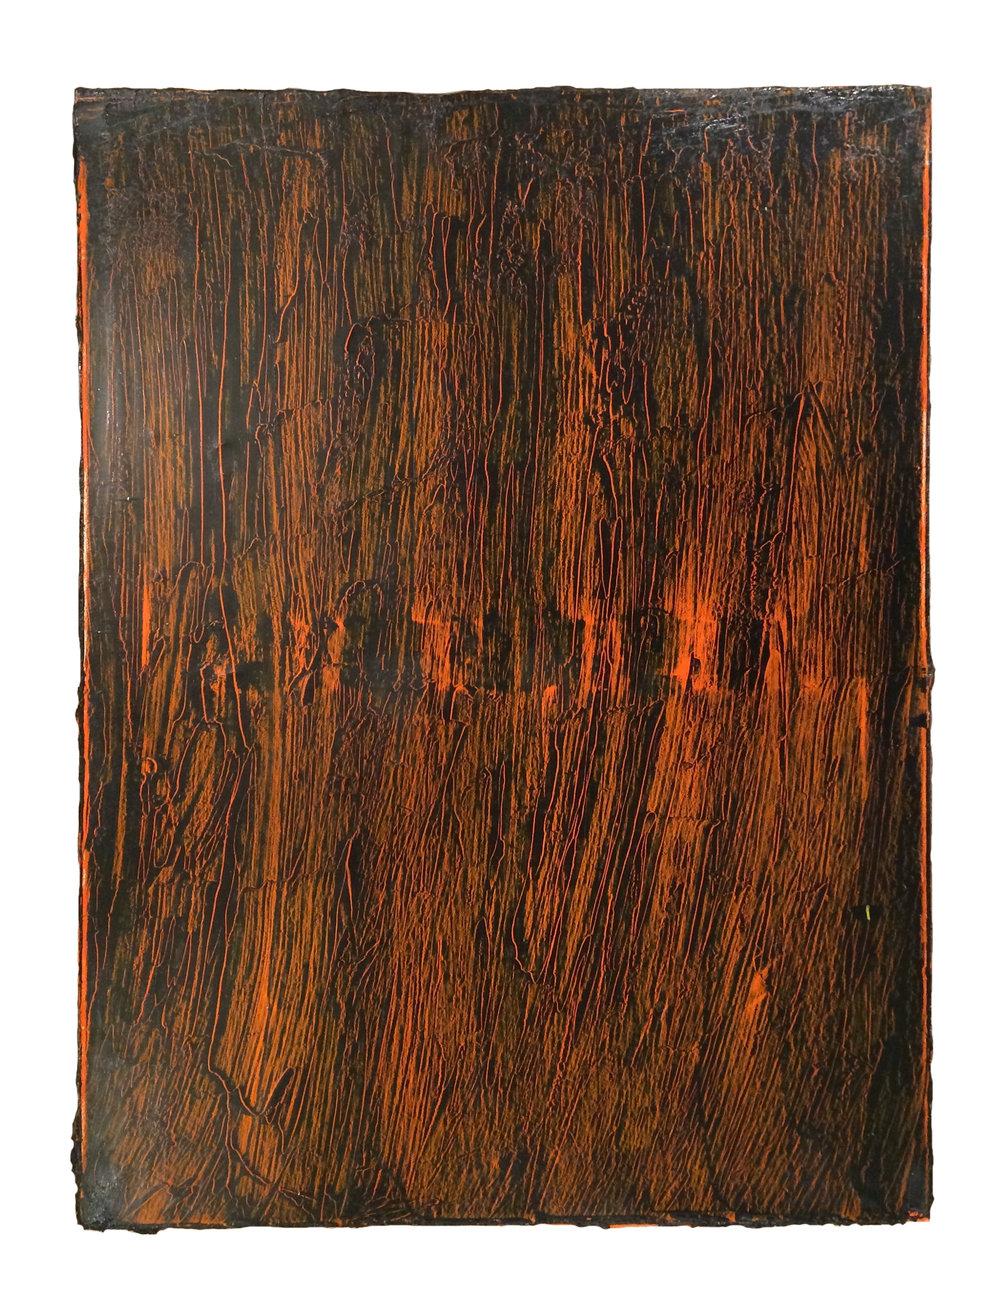 Orange Code    Oil on canvas  24 x 18 inches